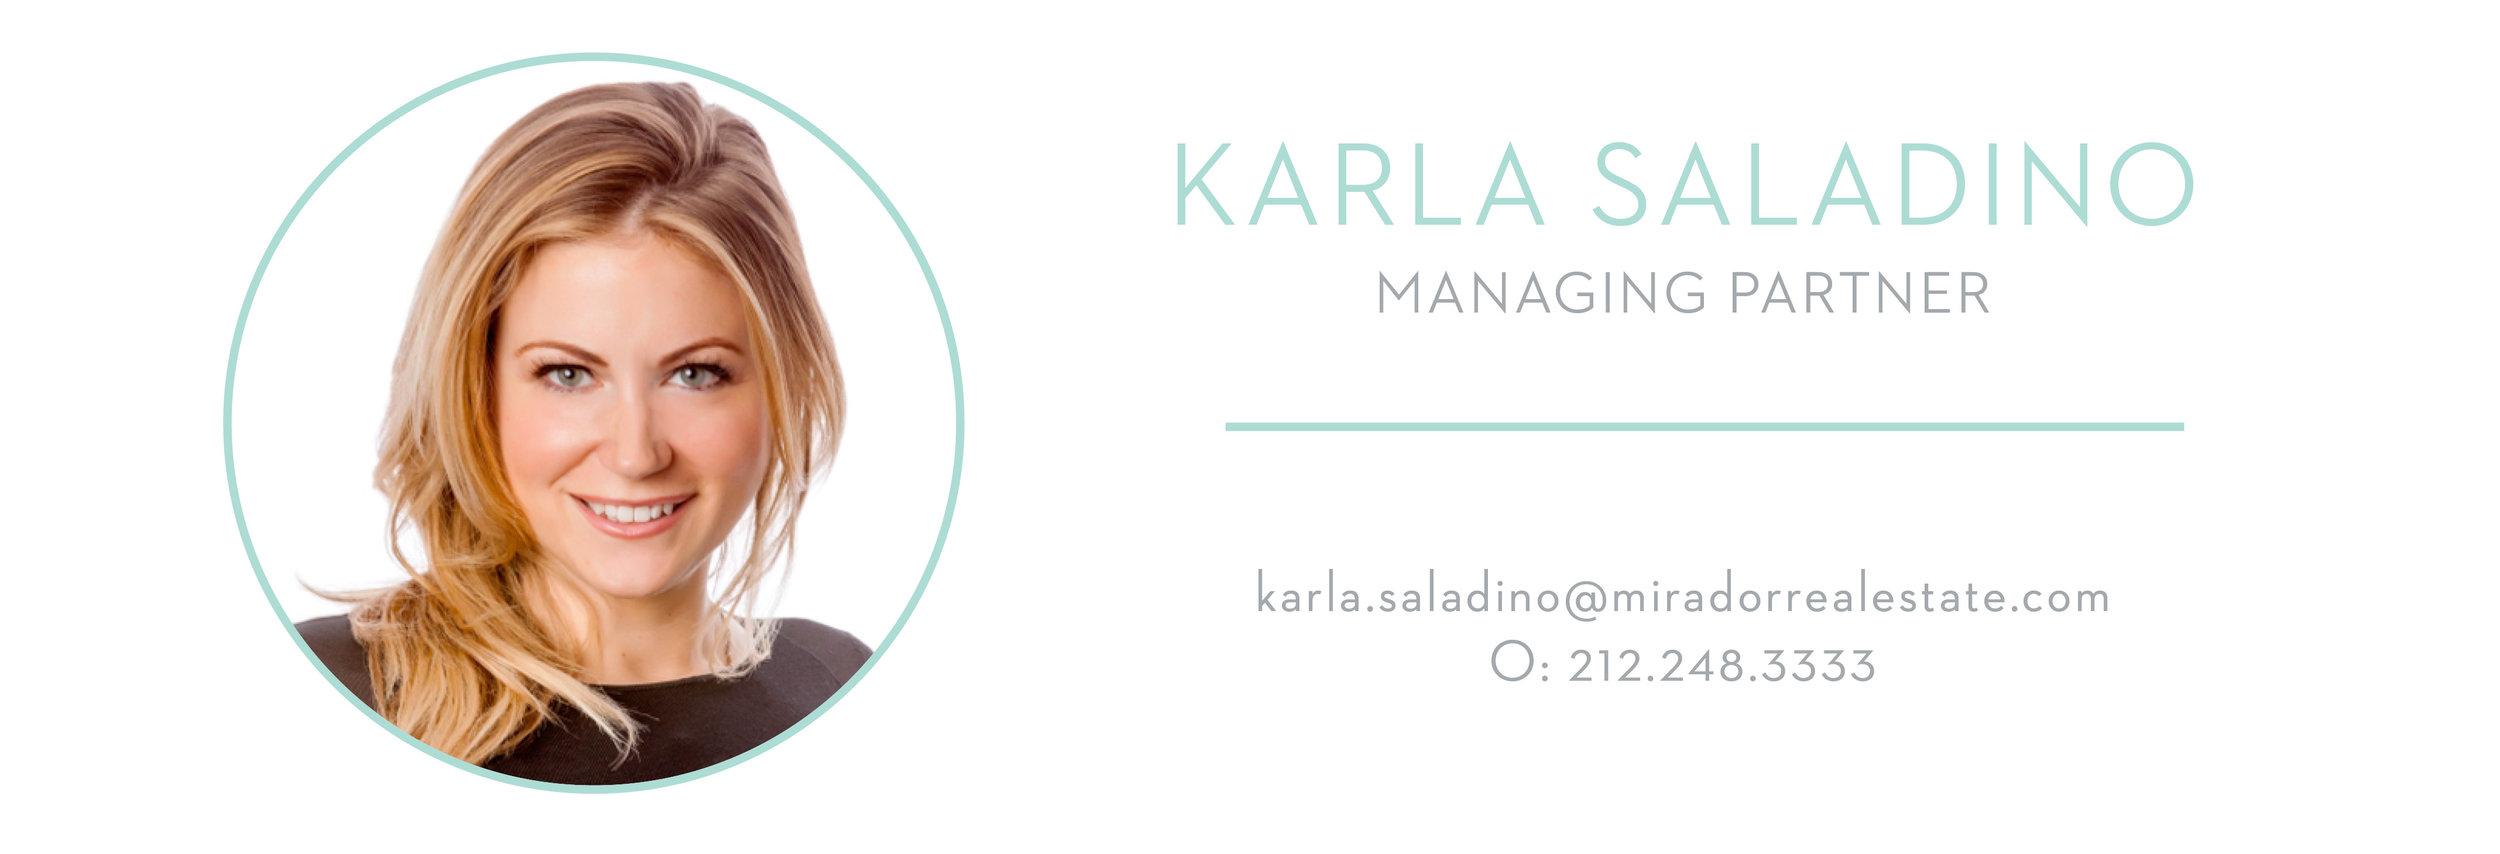 karla contact card.jpg